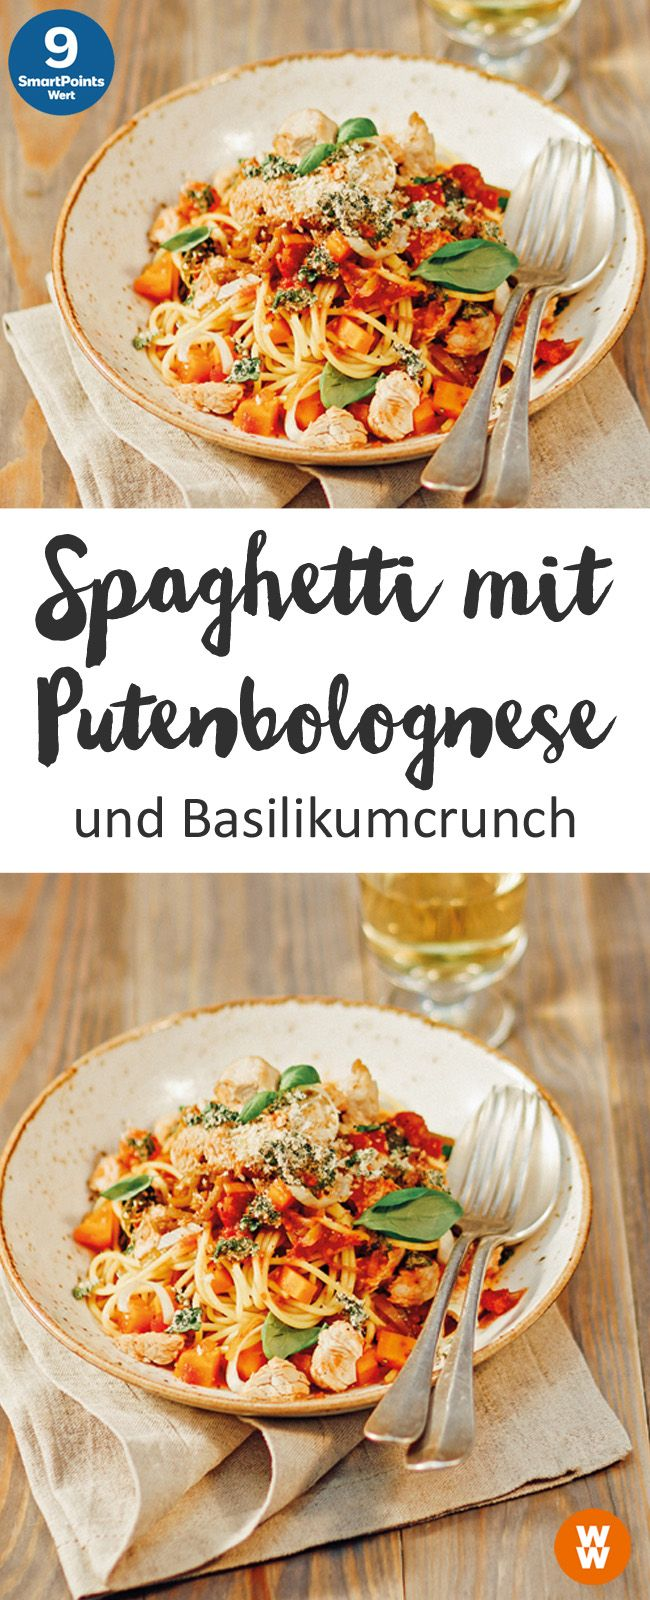 Spaghetti mit Putenbolognese und Basilikumcrunch, Pasta, Hauptgericht, Bolognes …